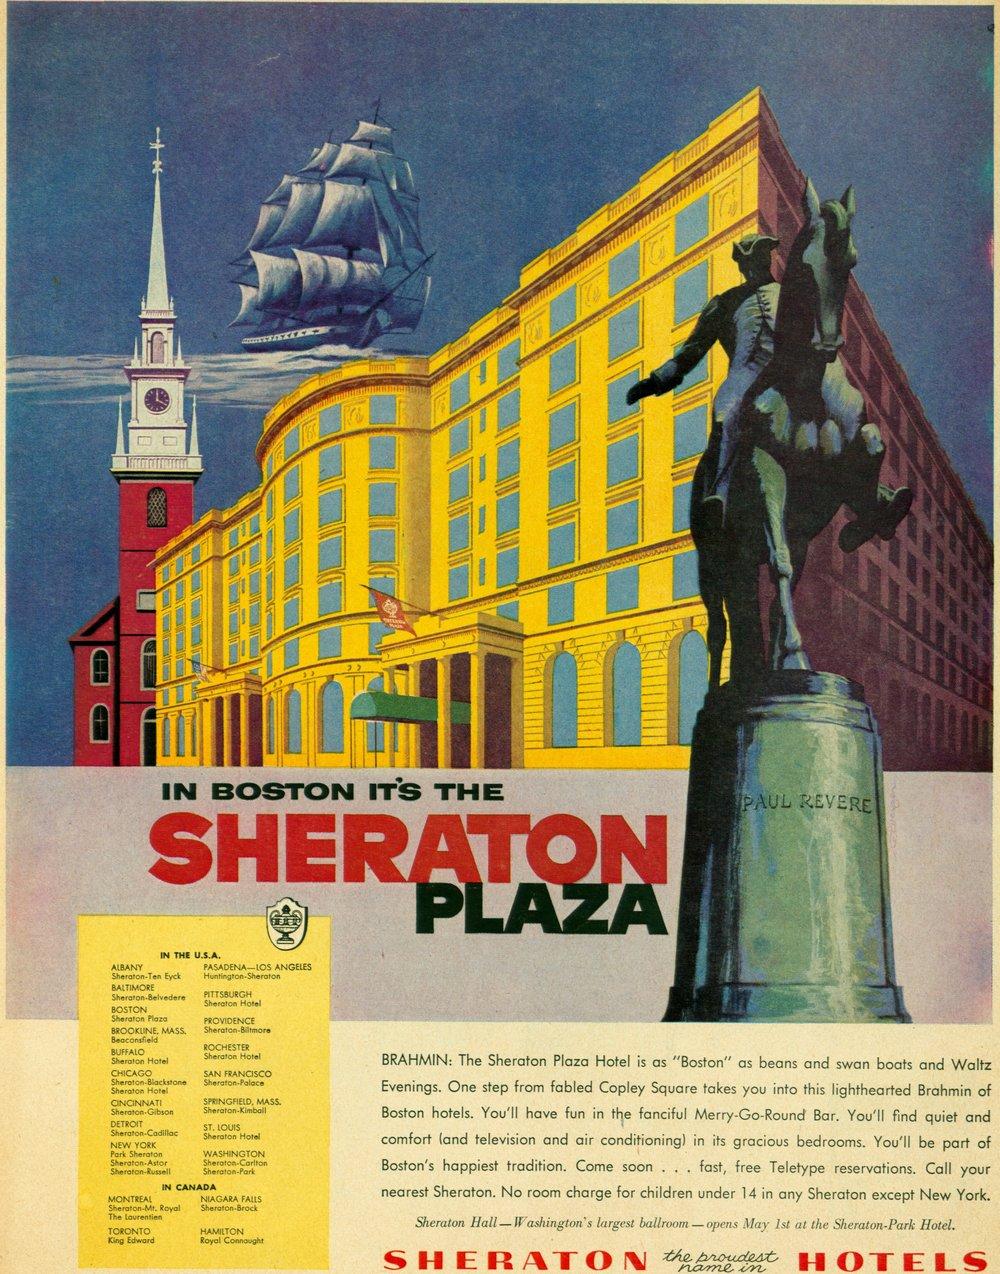 1956 - The Sheraton Plaza in Boston